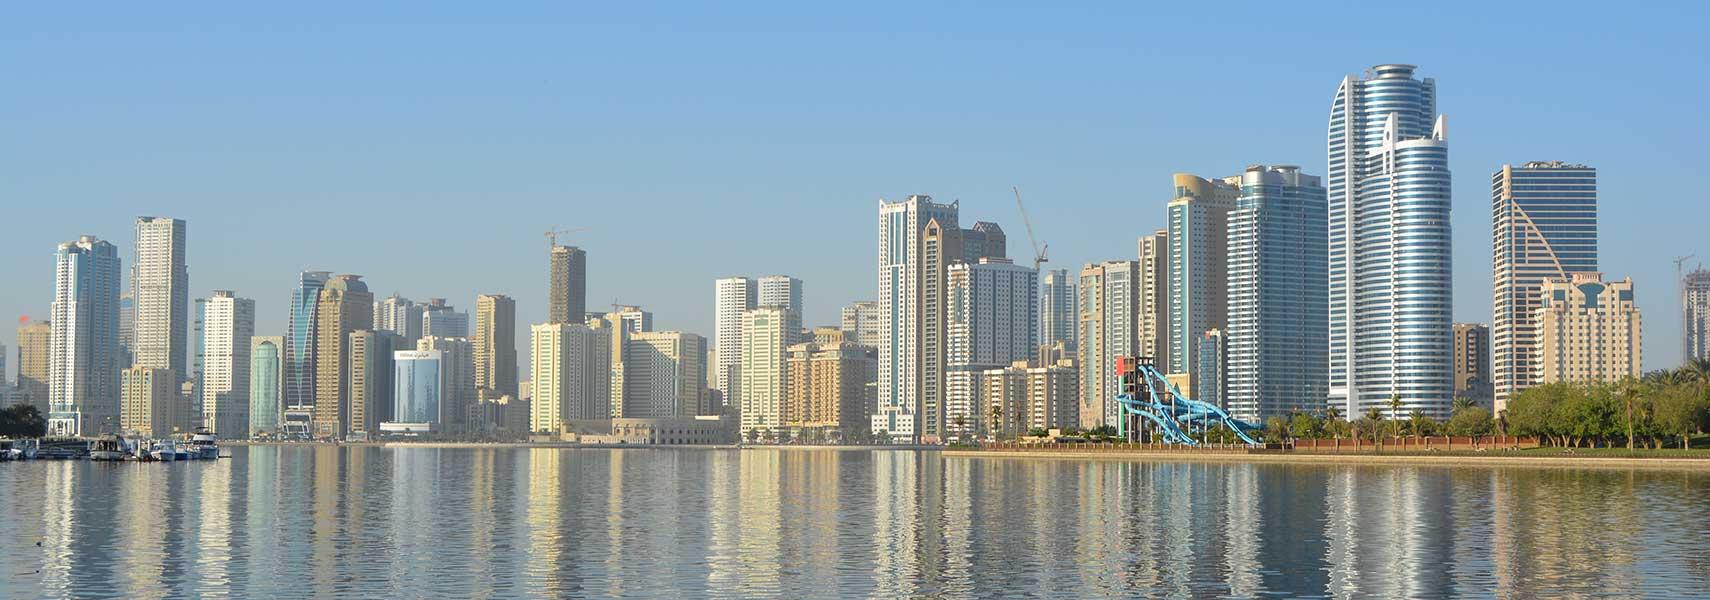 United Arab Emirates UAE Nations Online Project